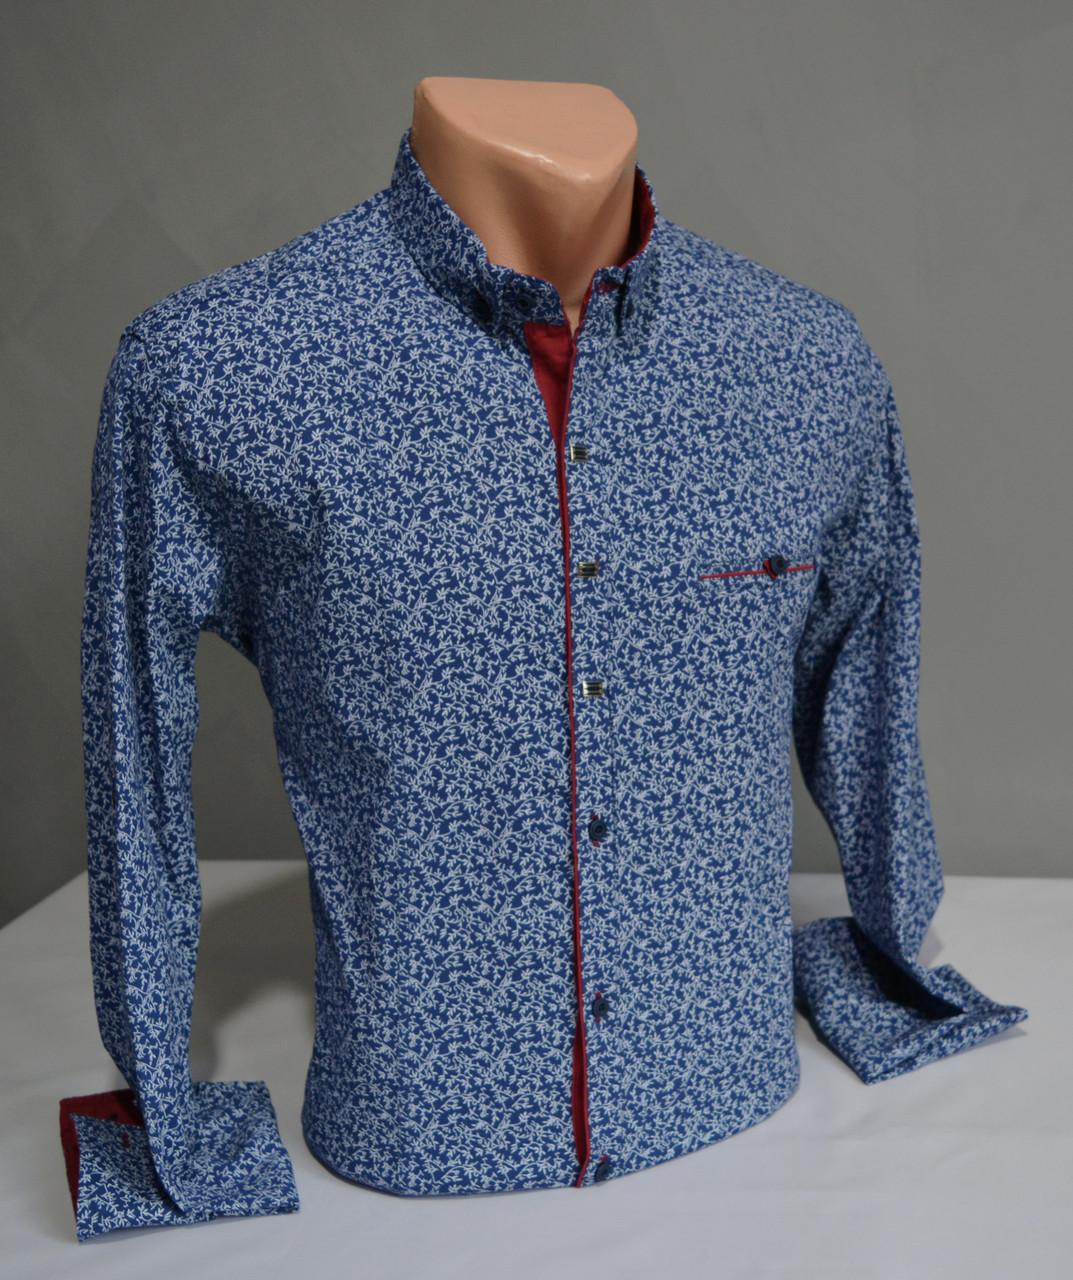 0c3c50c0b68 Мужская рубашка G-port с узором  продажа